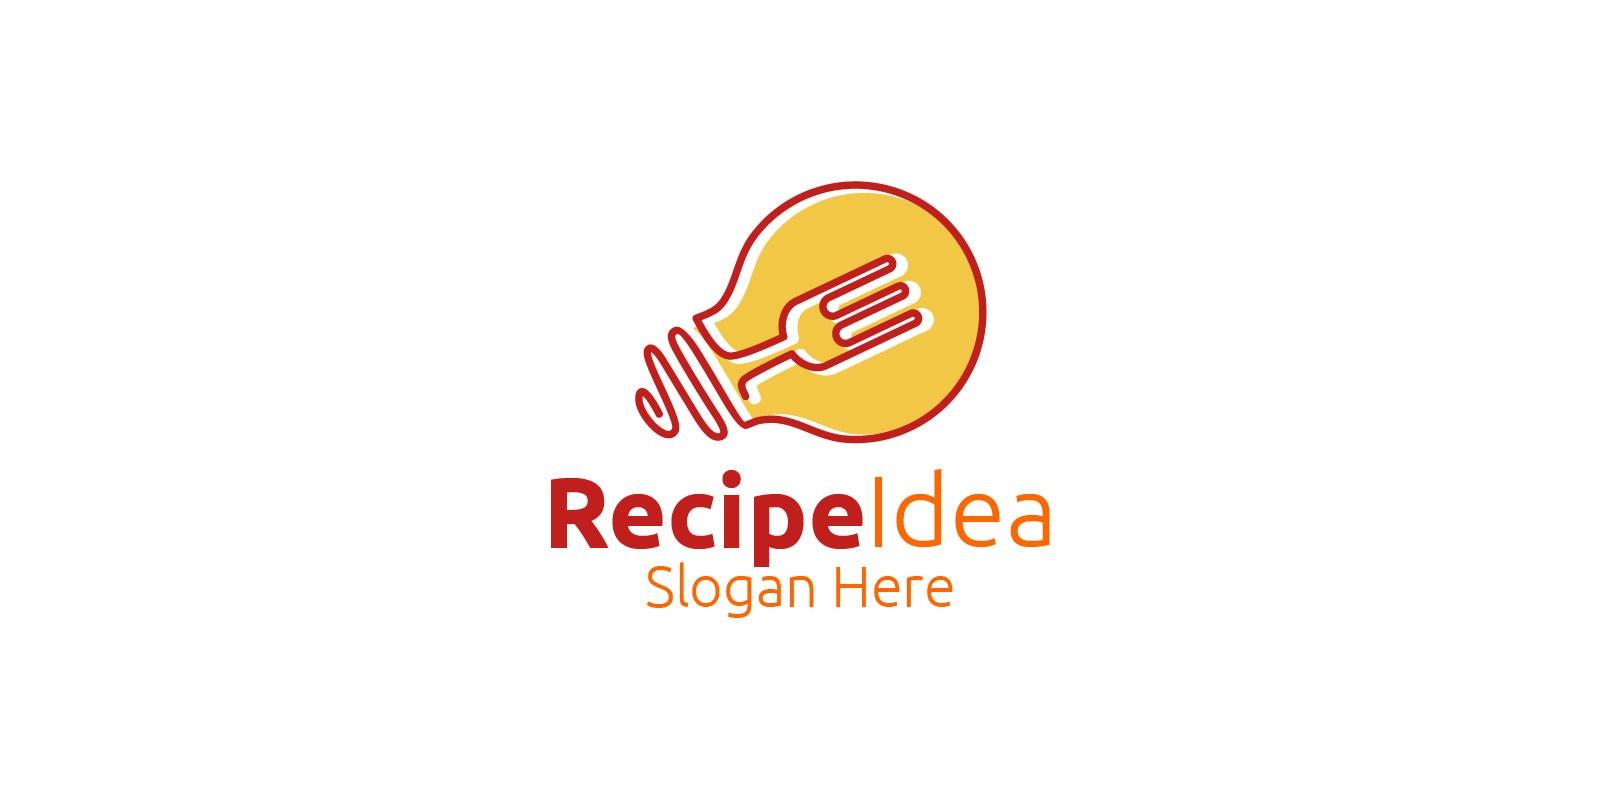 Recipe Idea Food Logo For Restaurant Or Cafe